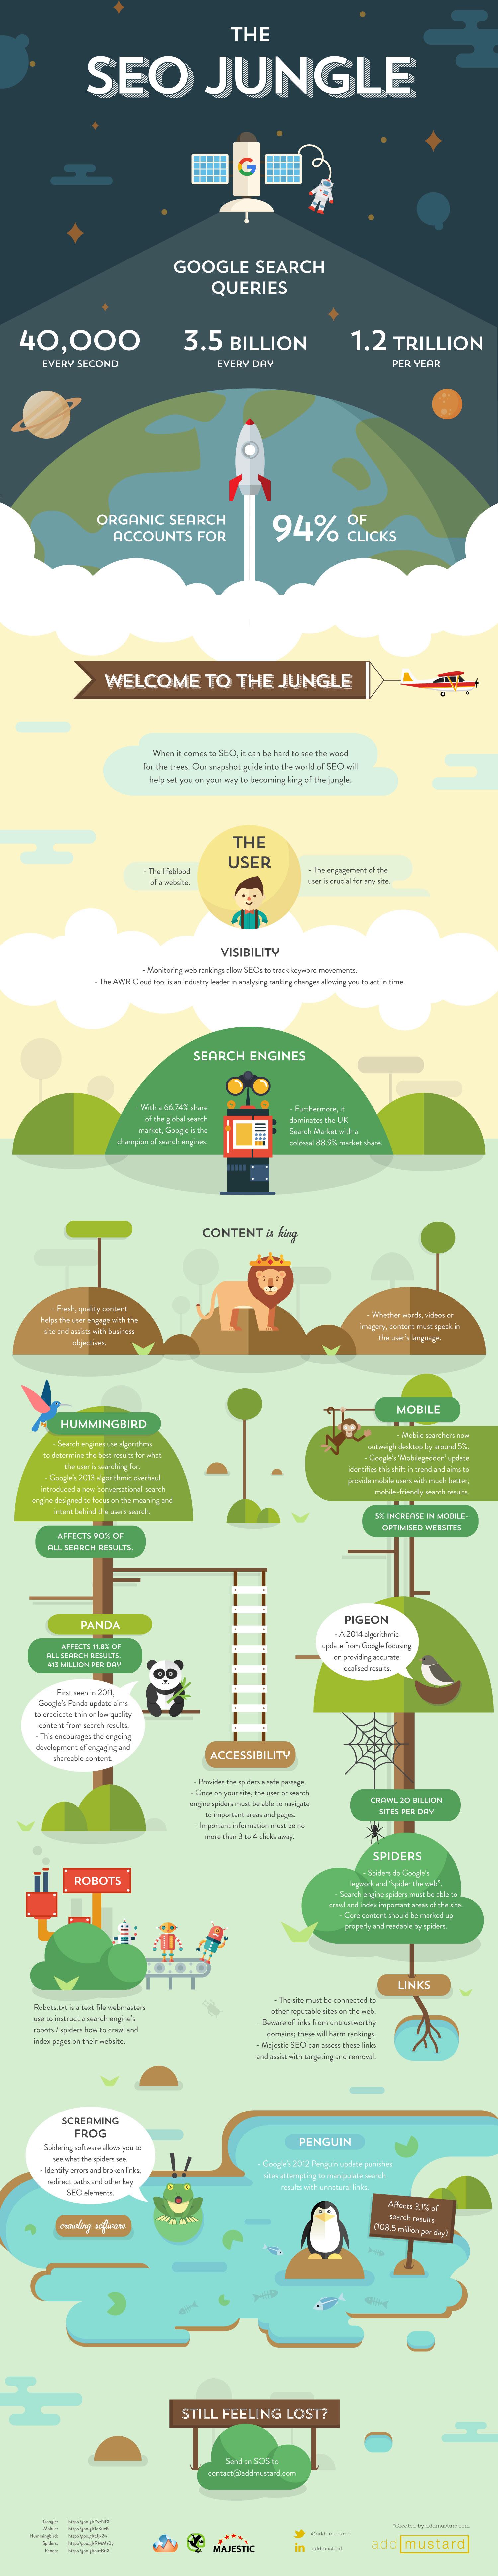 SEO: A Jungle survival guide - #Infographic